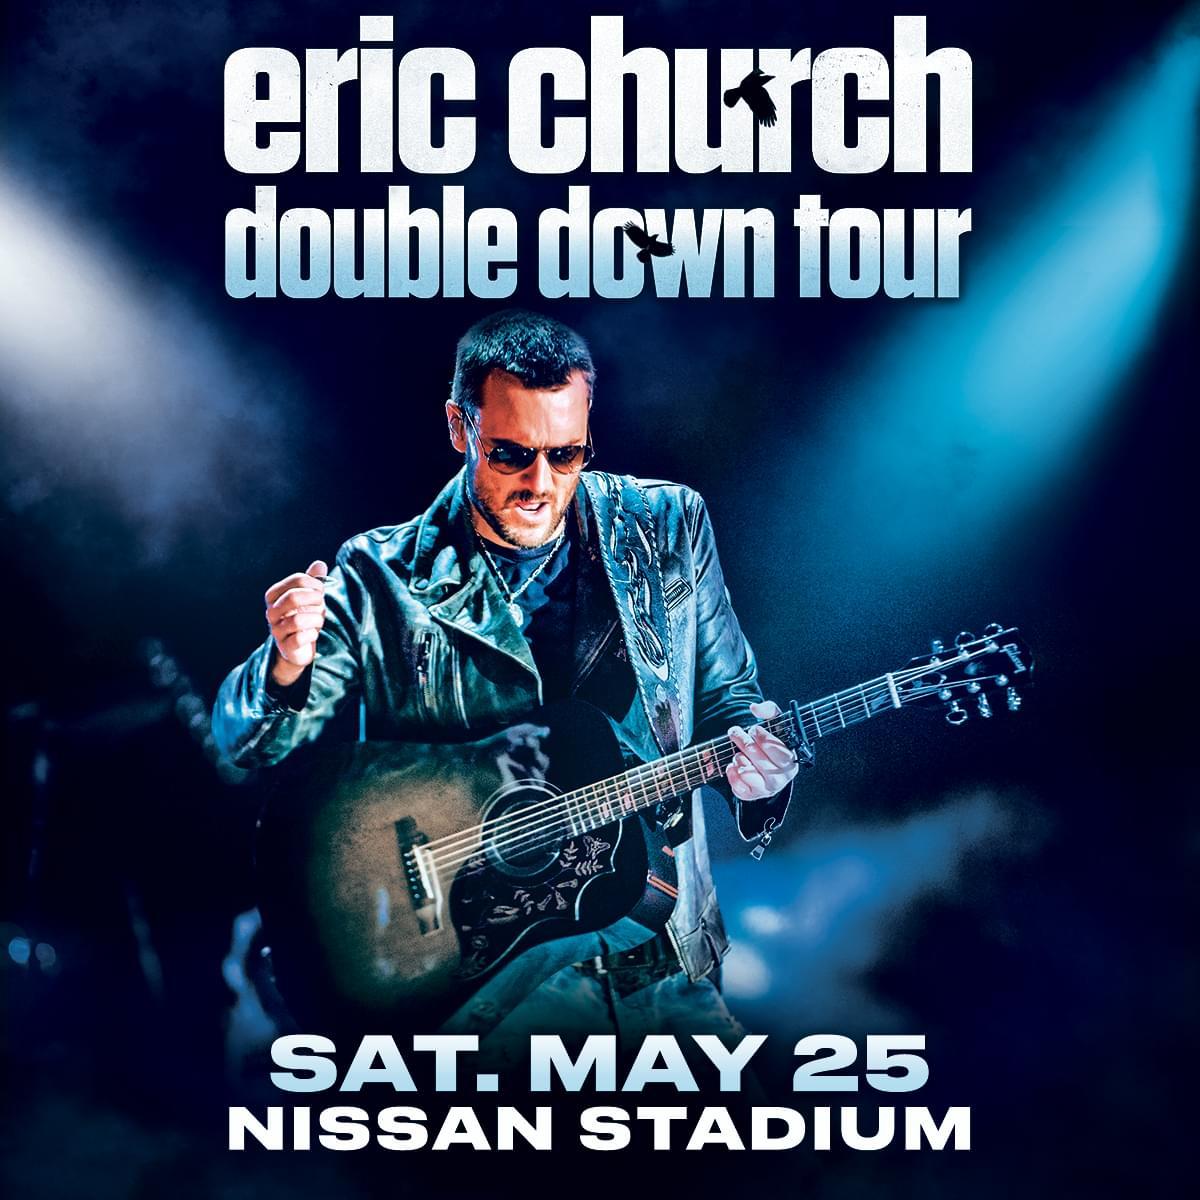 EricChurch-social-1200x1200-0525-Nashville